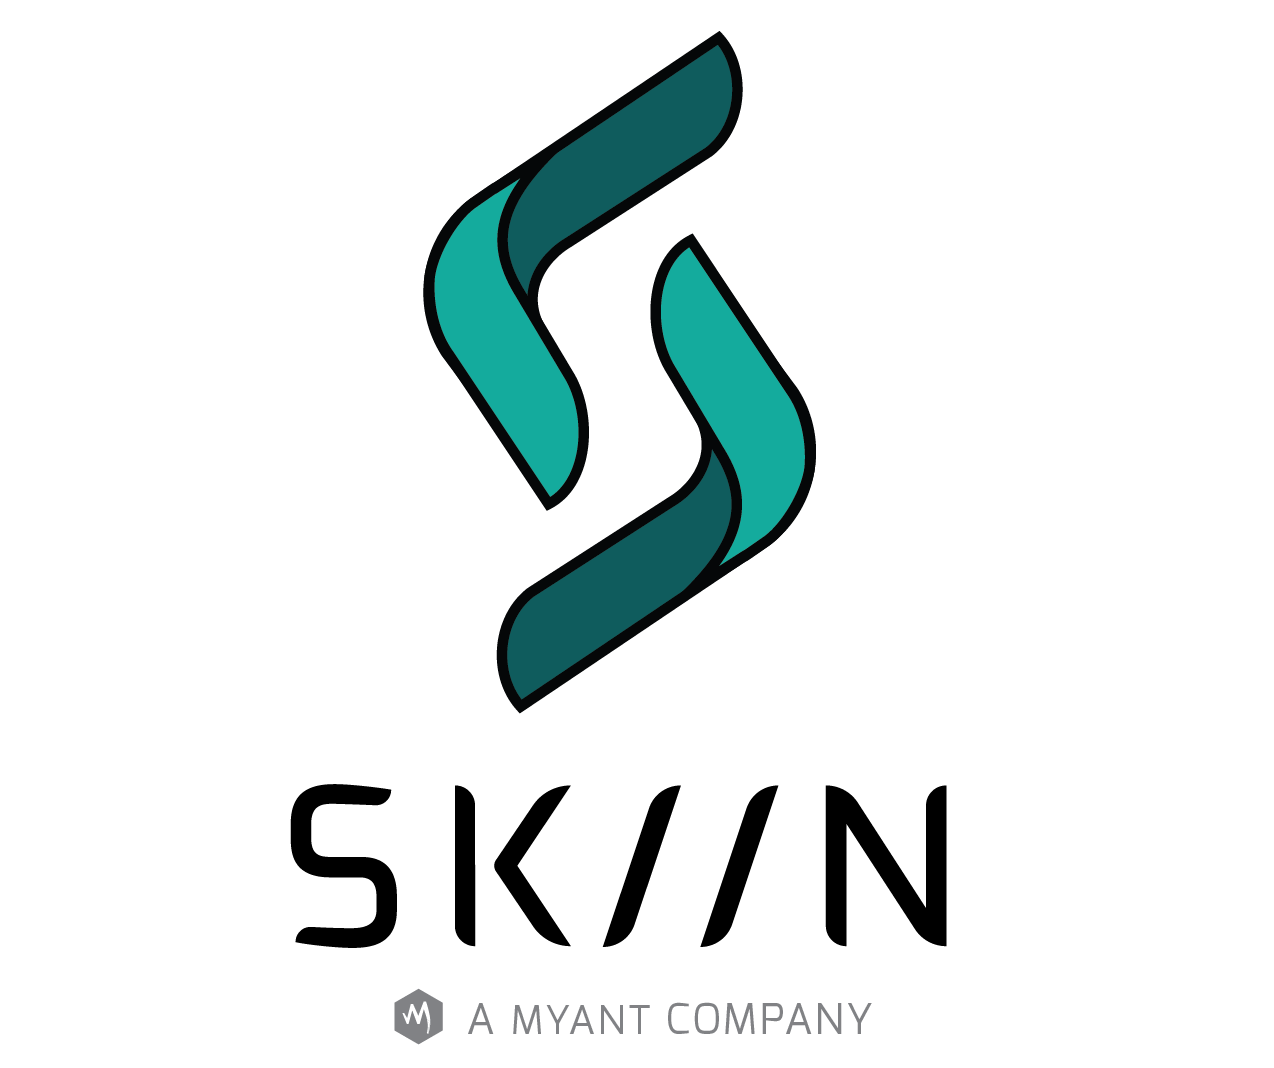 Myant